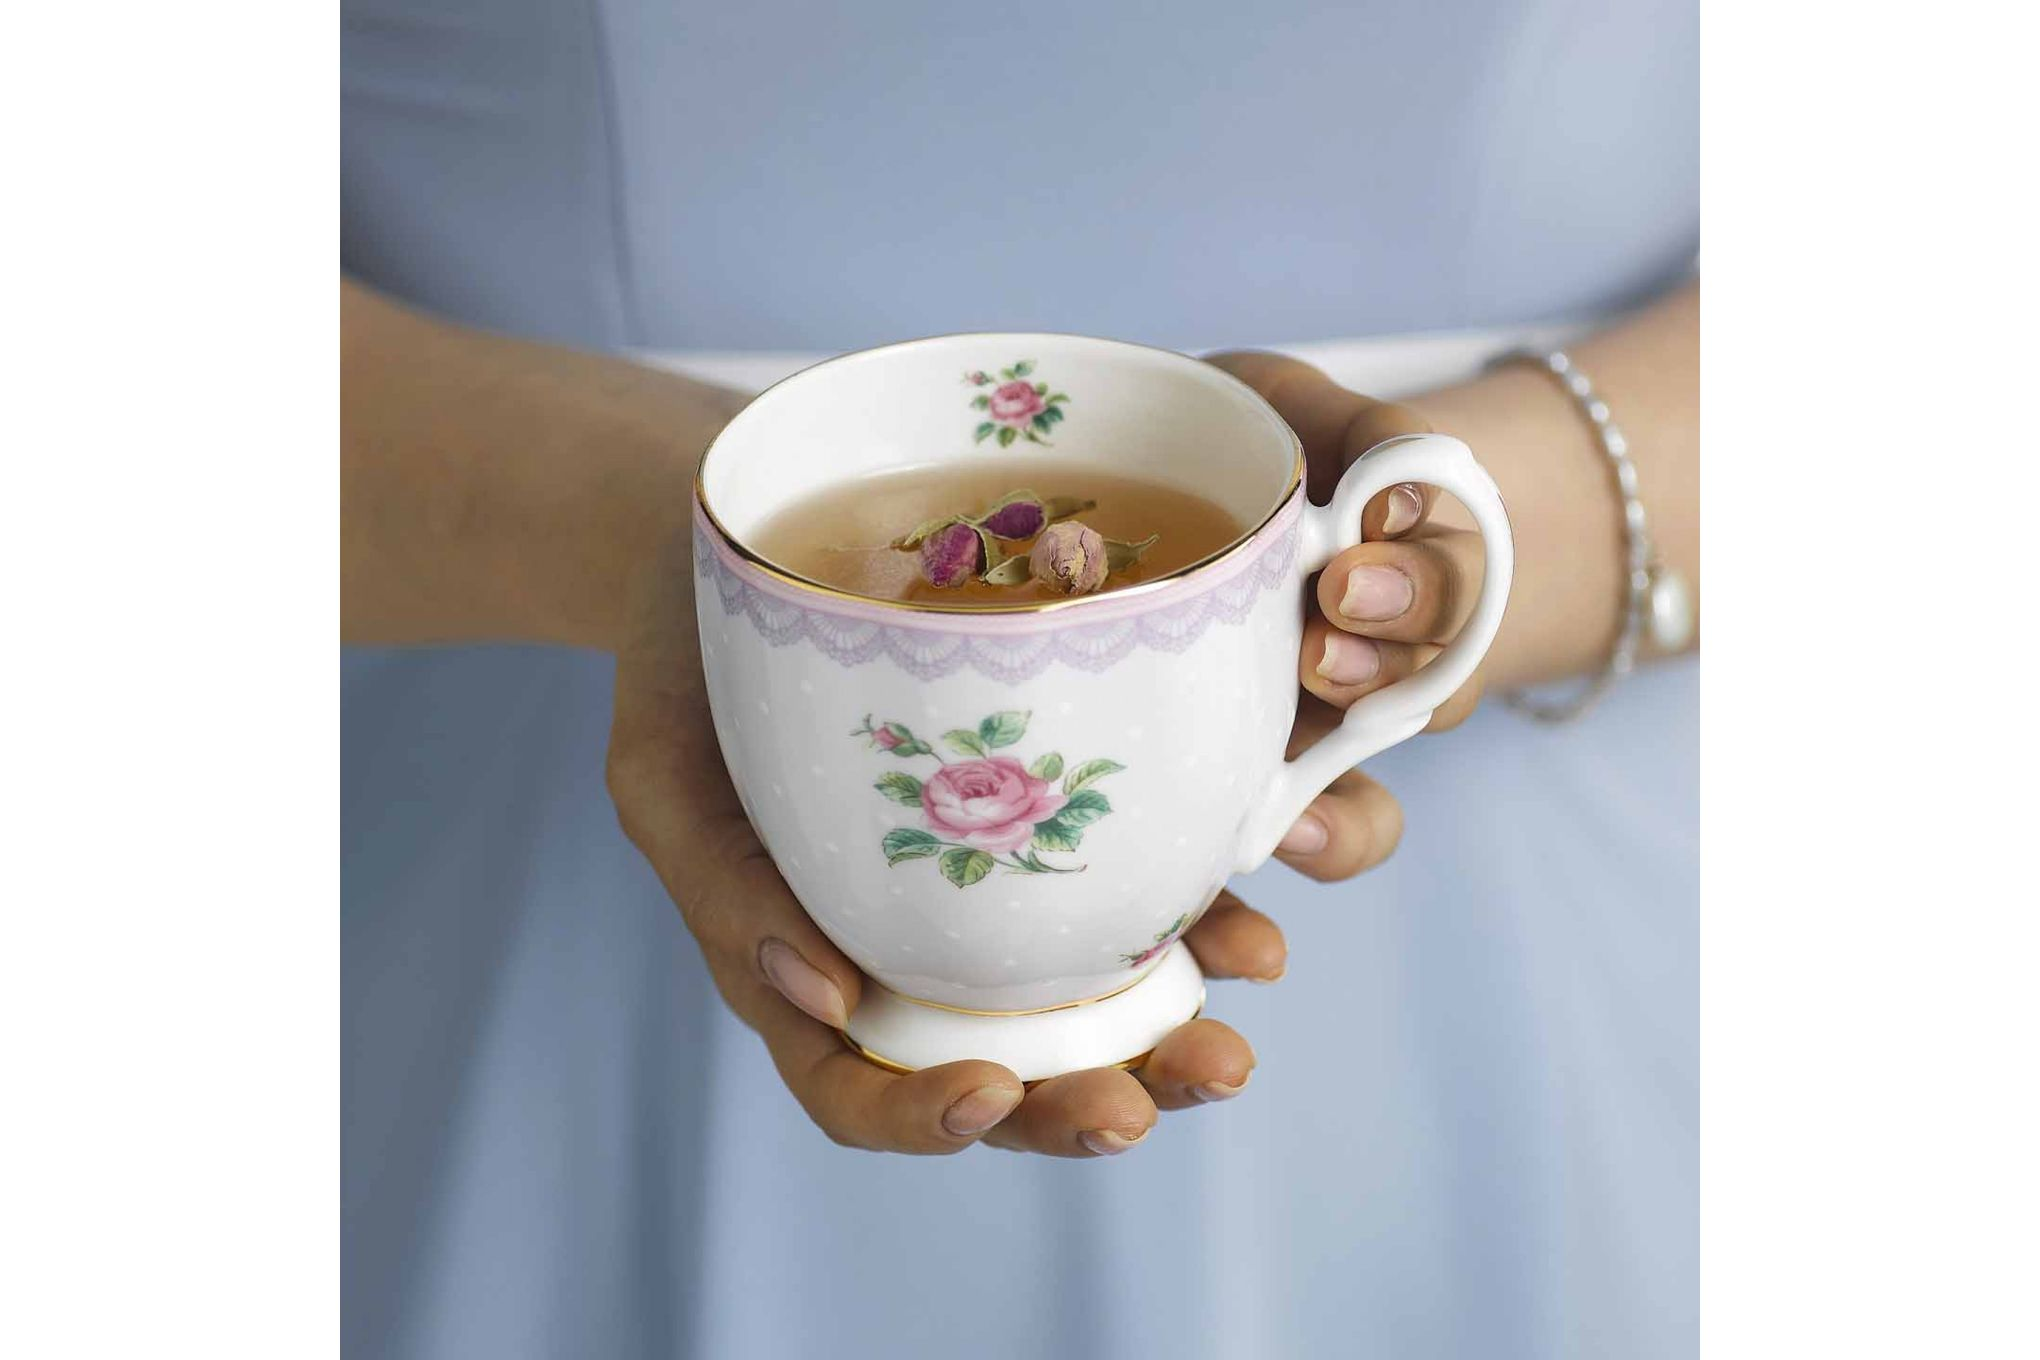 Royal Albert Candy Collection Mug Love Lilac 0.3l thumb 4